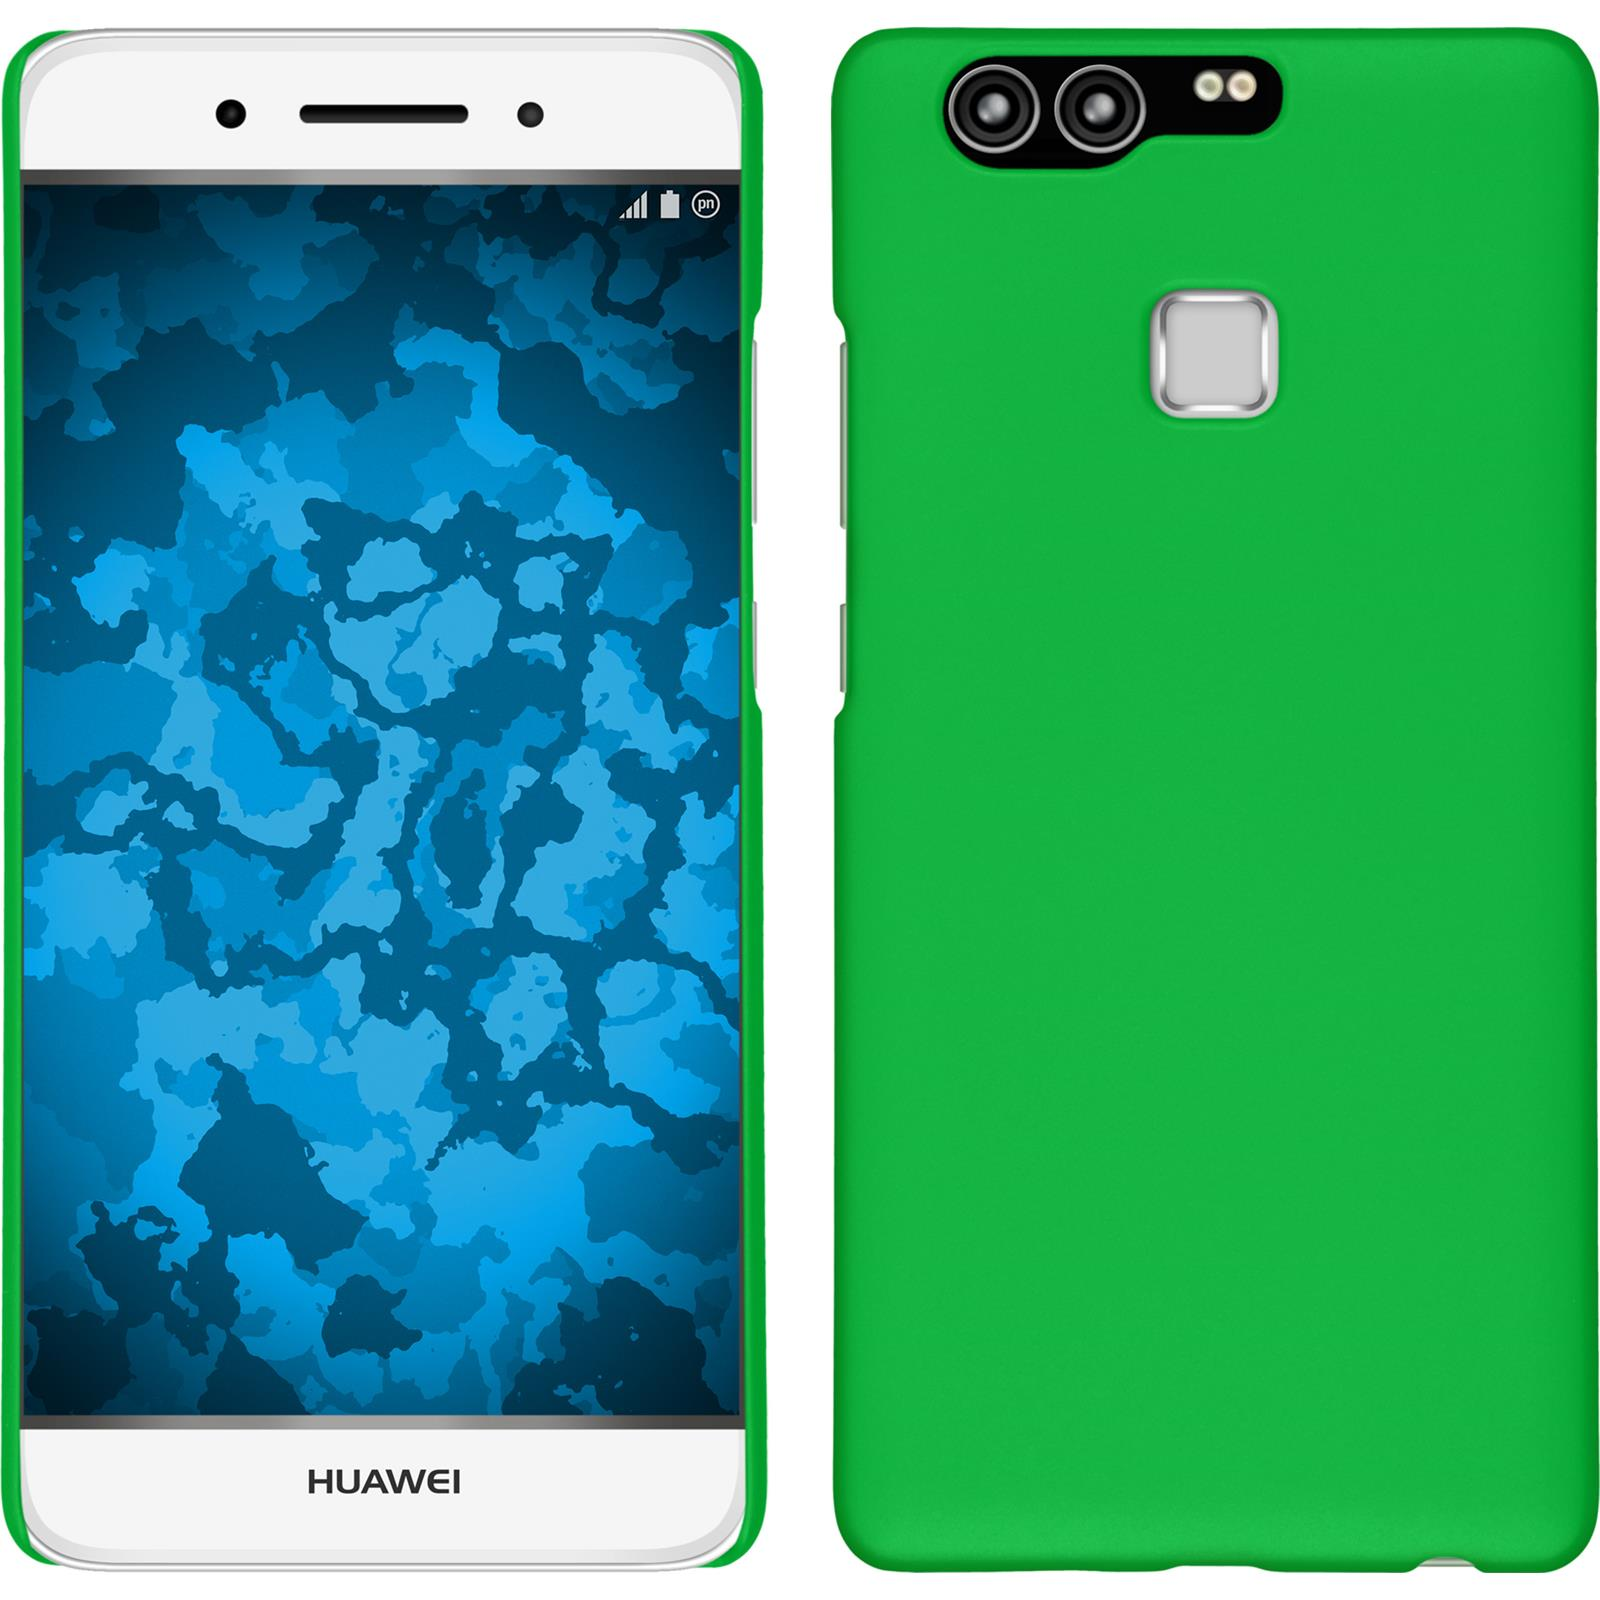 Funda-Rigida-Huawei-P9-goma-protector-de-pantalla